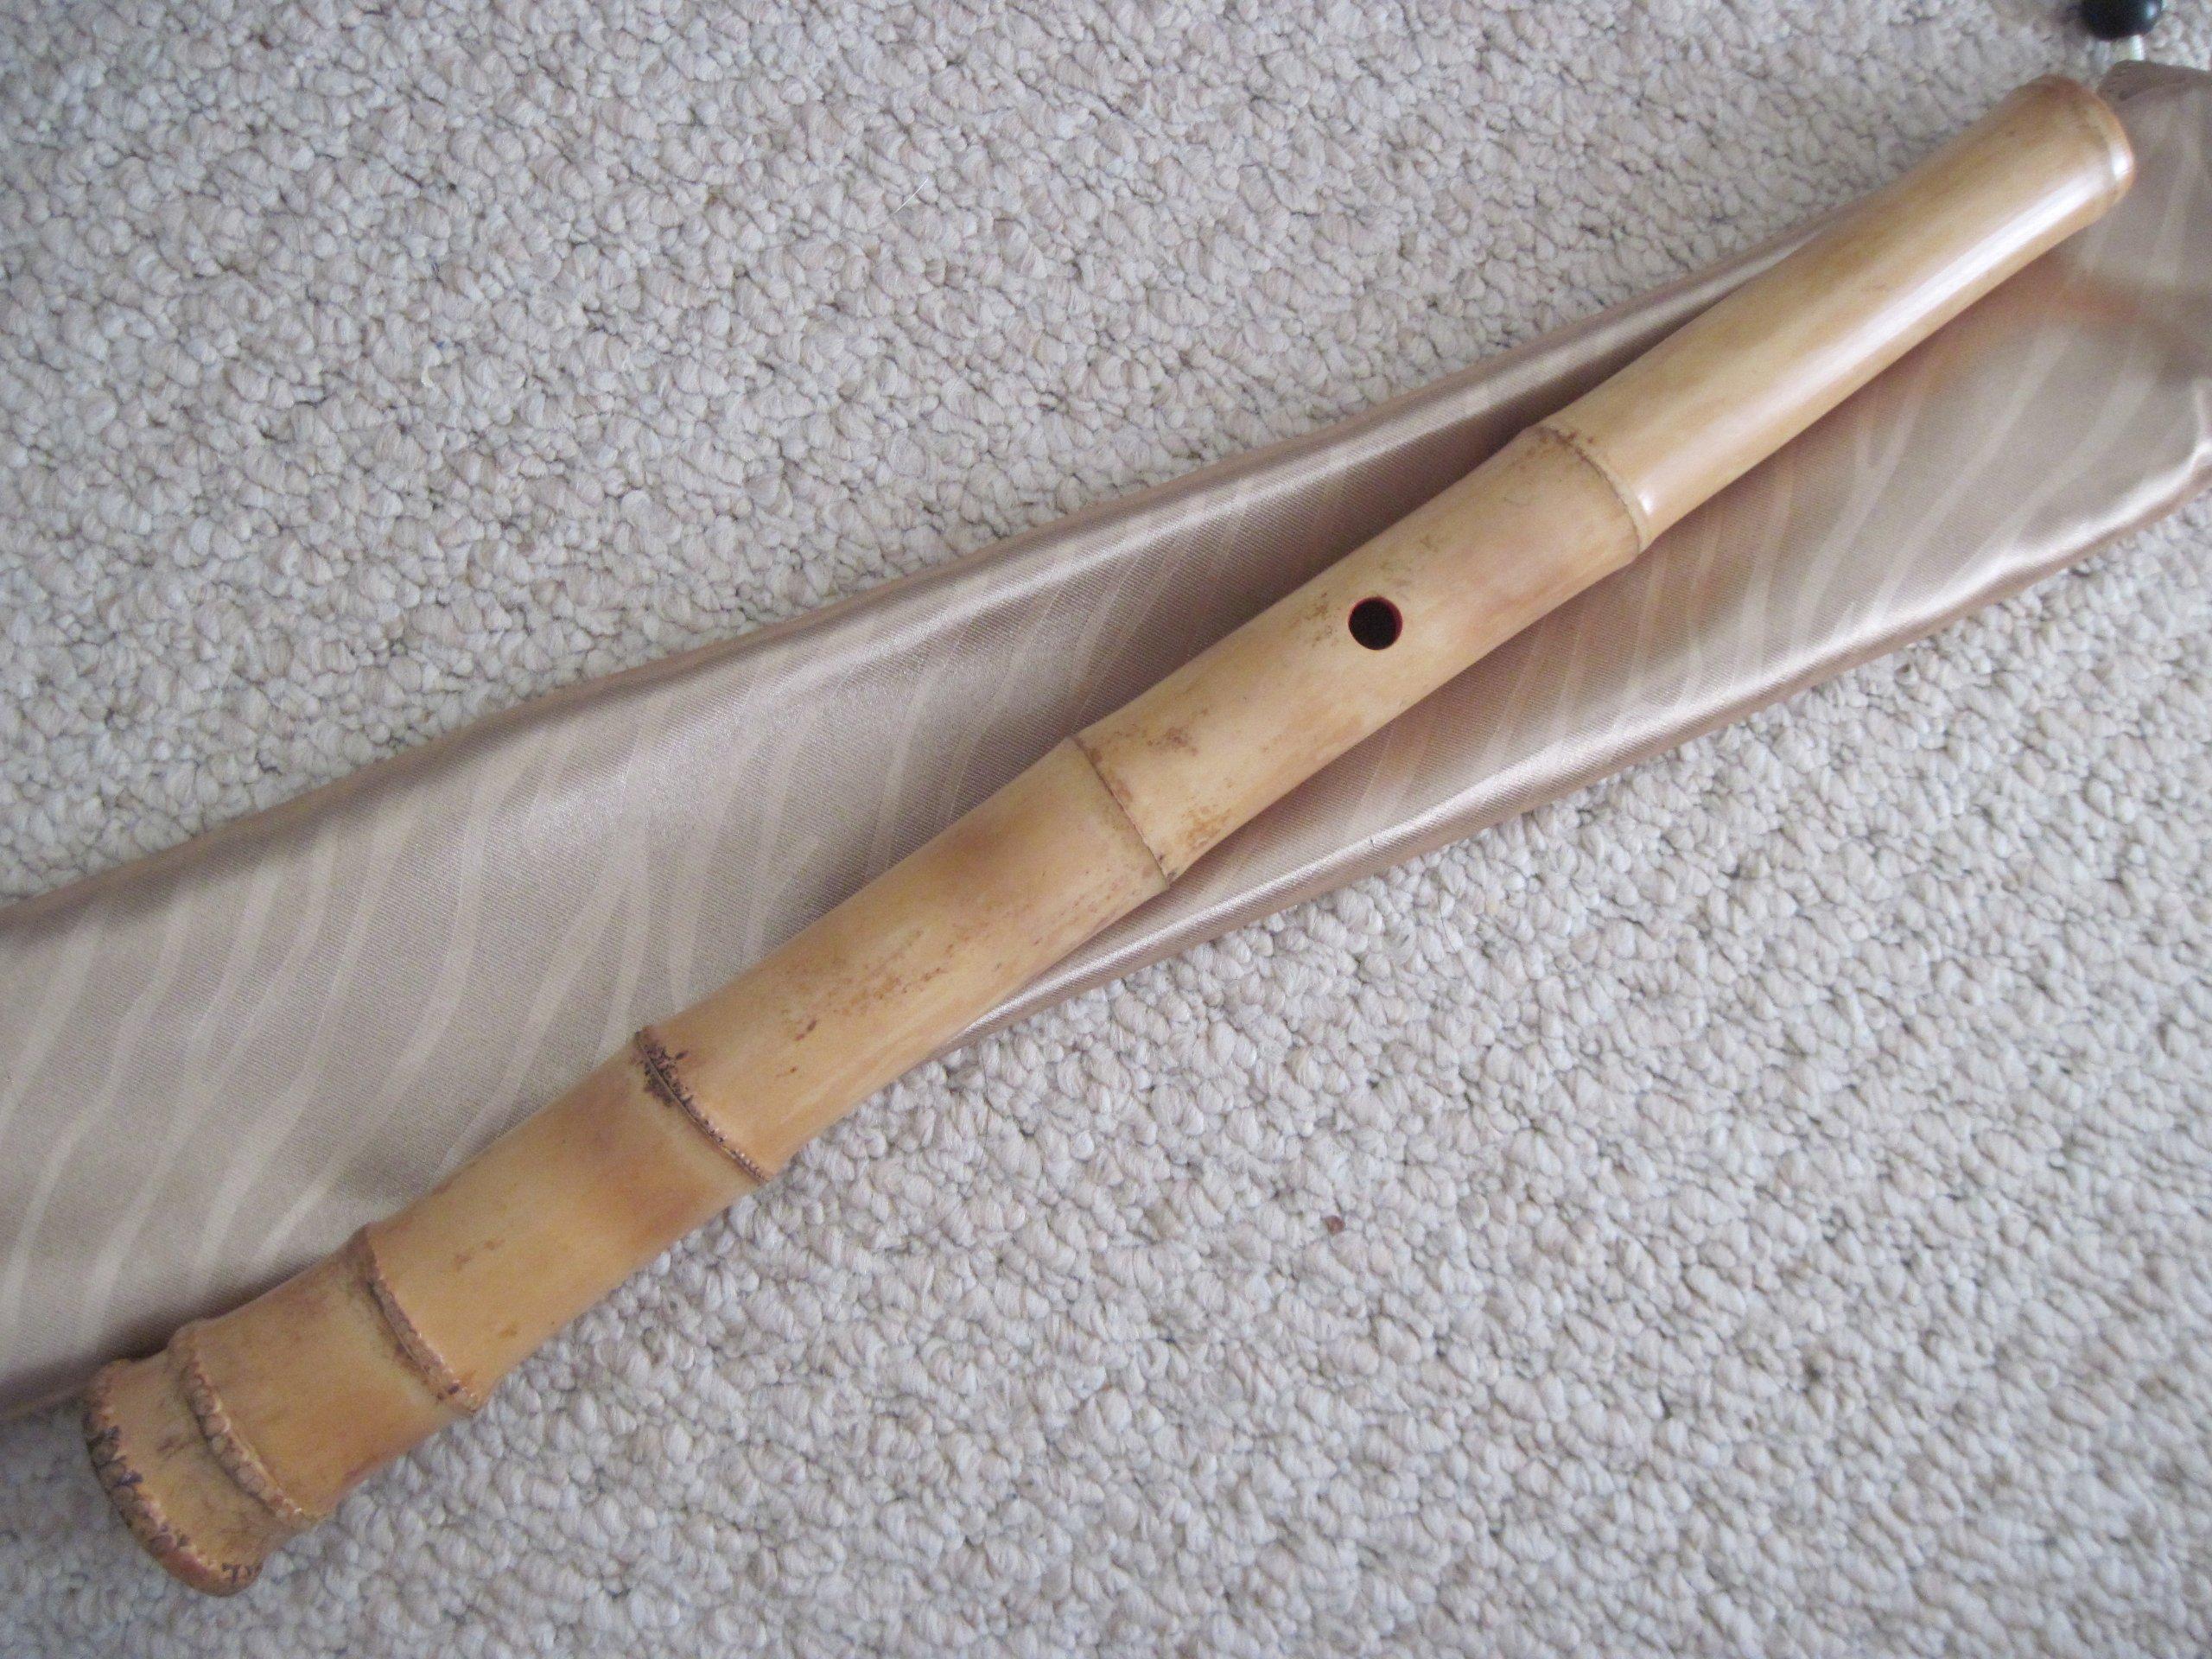 1.6 Pentatonic Shakuhachi with Root End 5 Holes Kinko Wudaguji inlet with buffalo horn flake- Traditional Zen Instrument by Dragon Jing (Image #6)